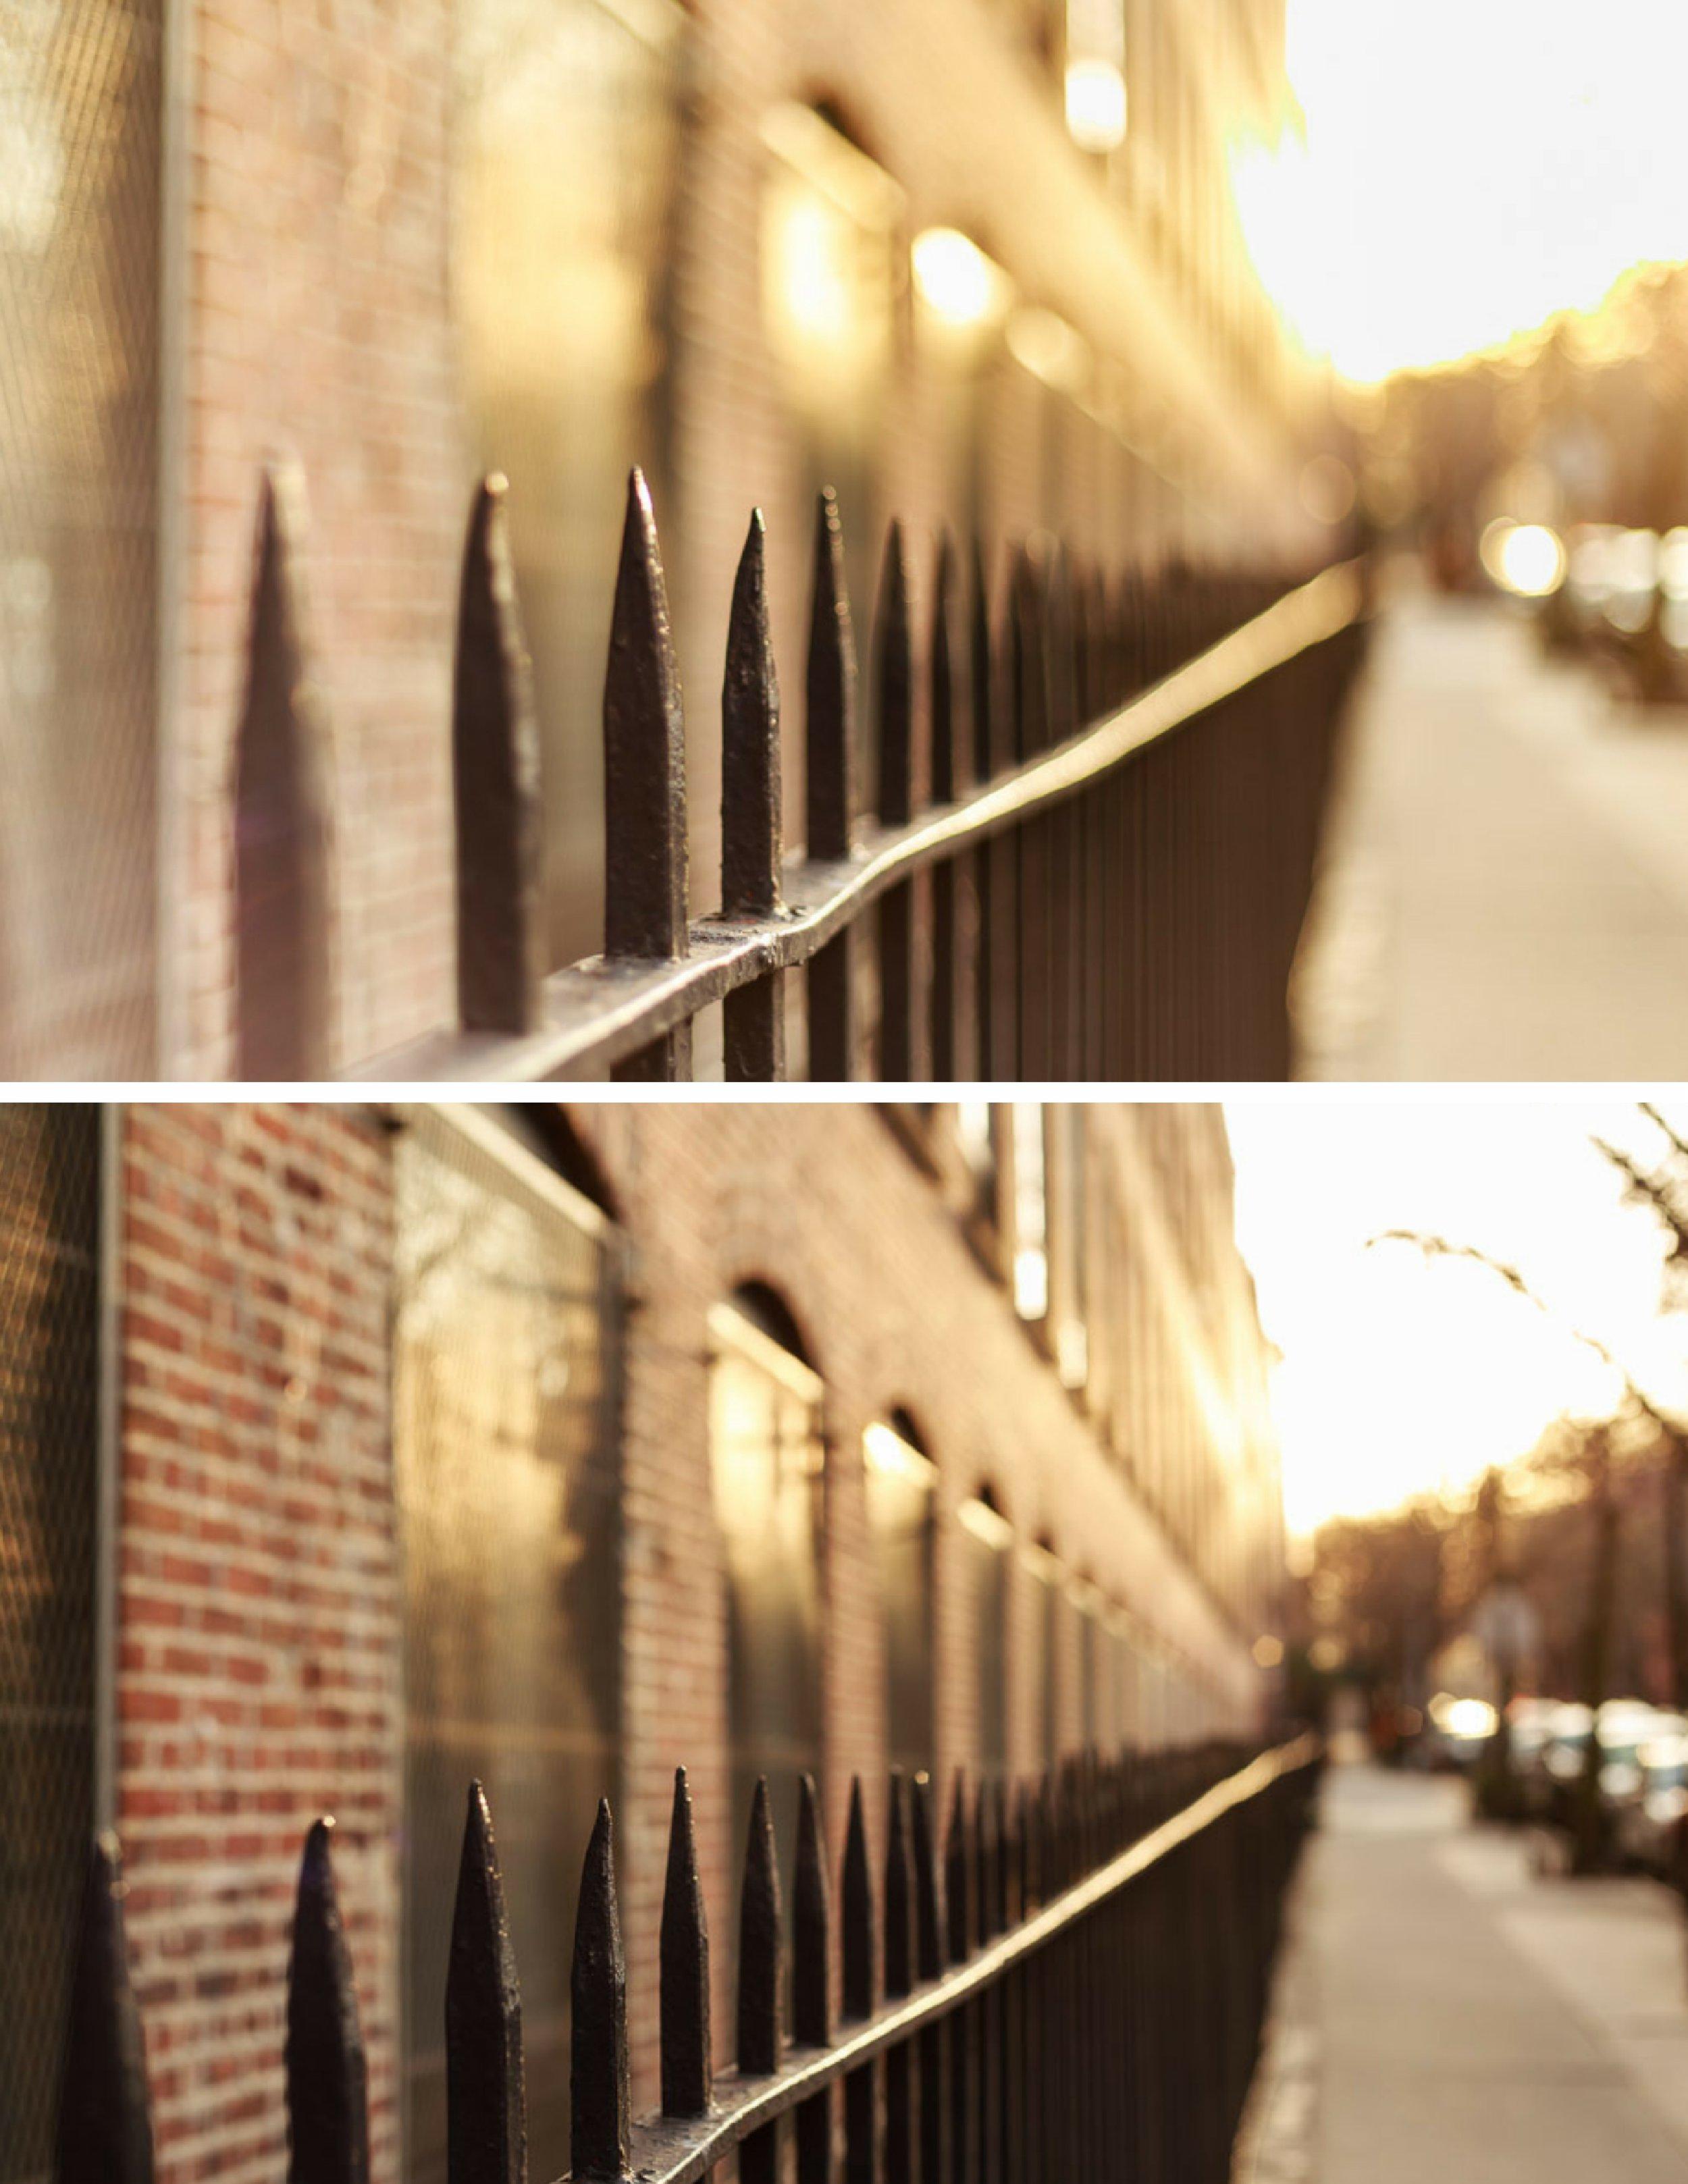 fstop-aperture-photography-learn-orlando-class.jpg